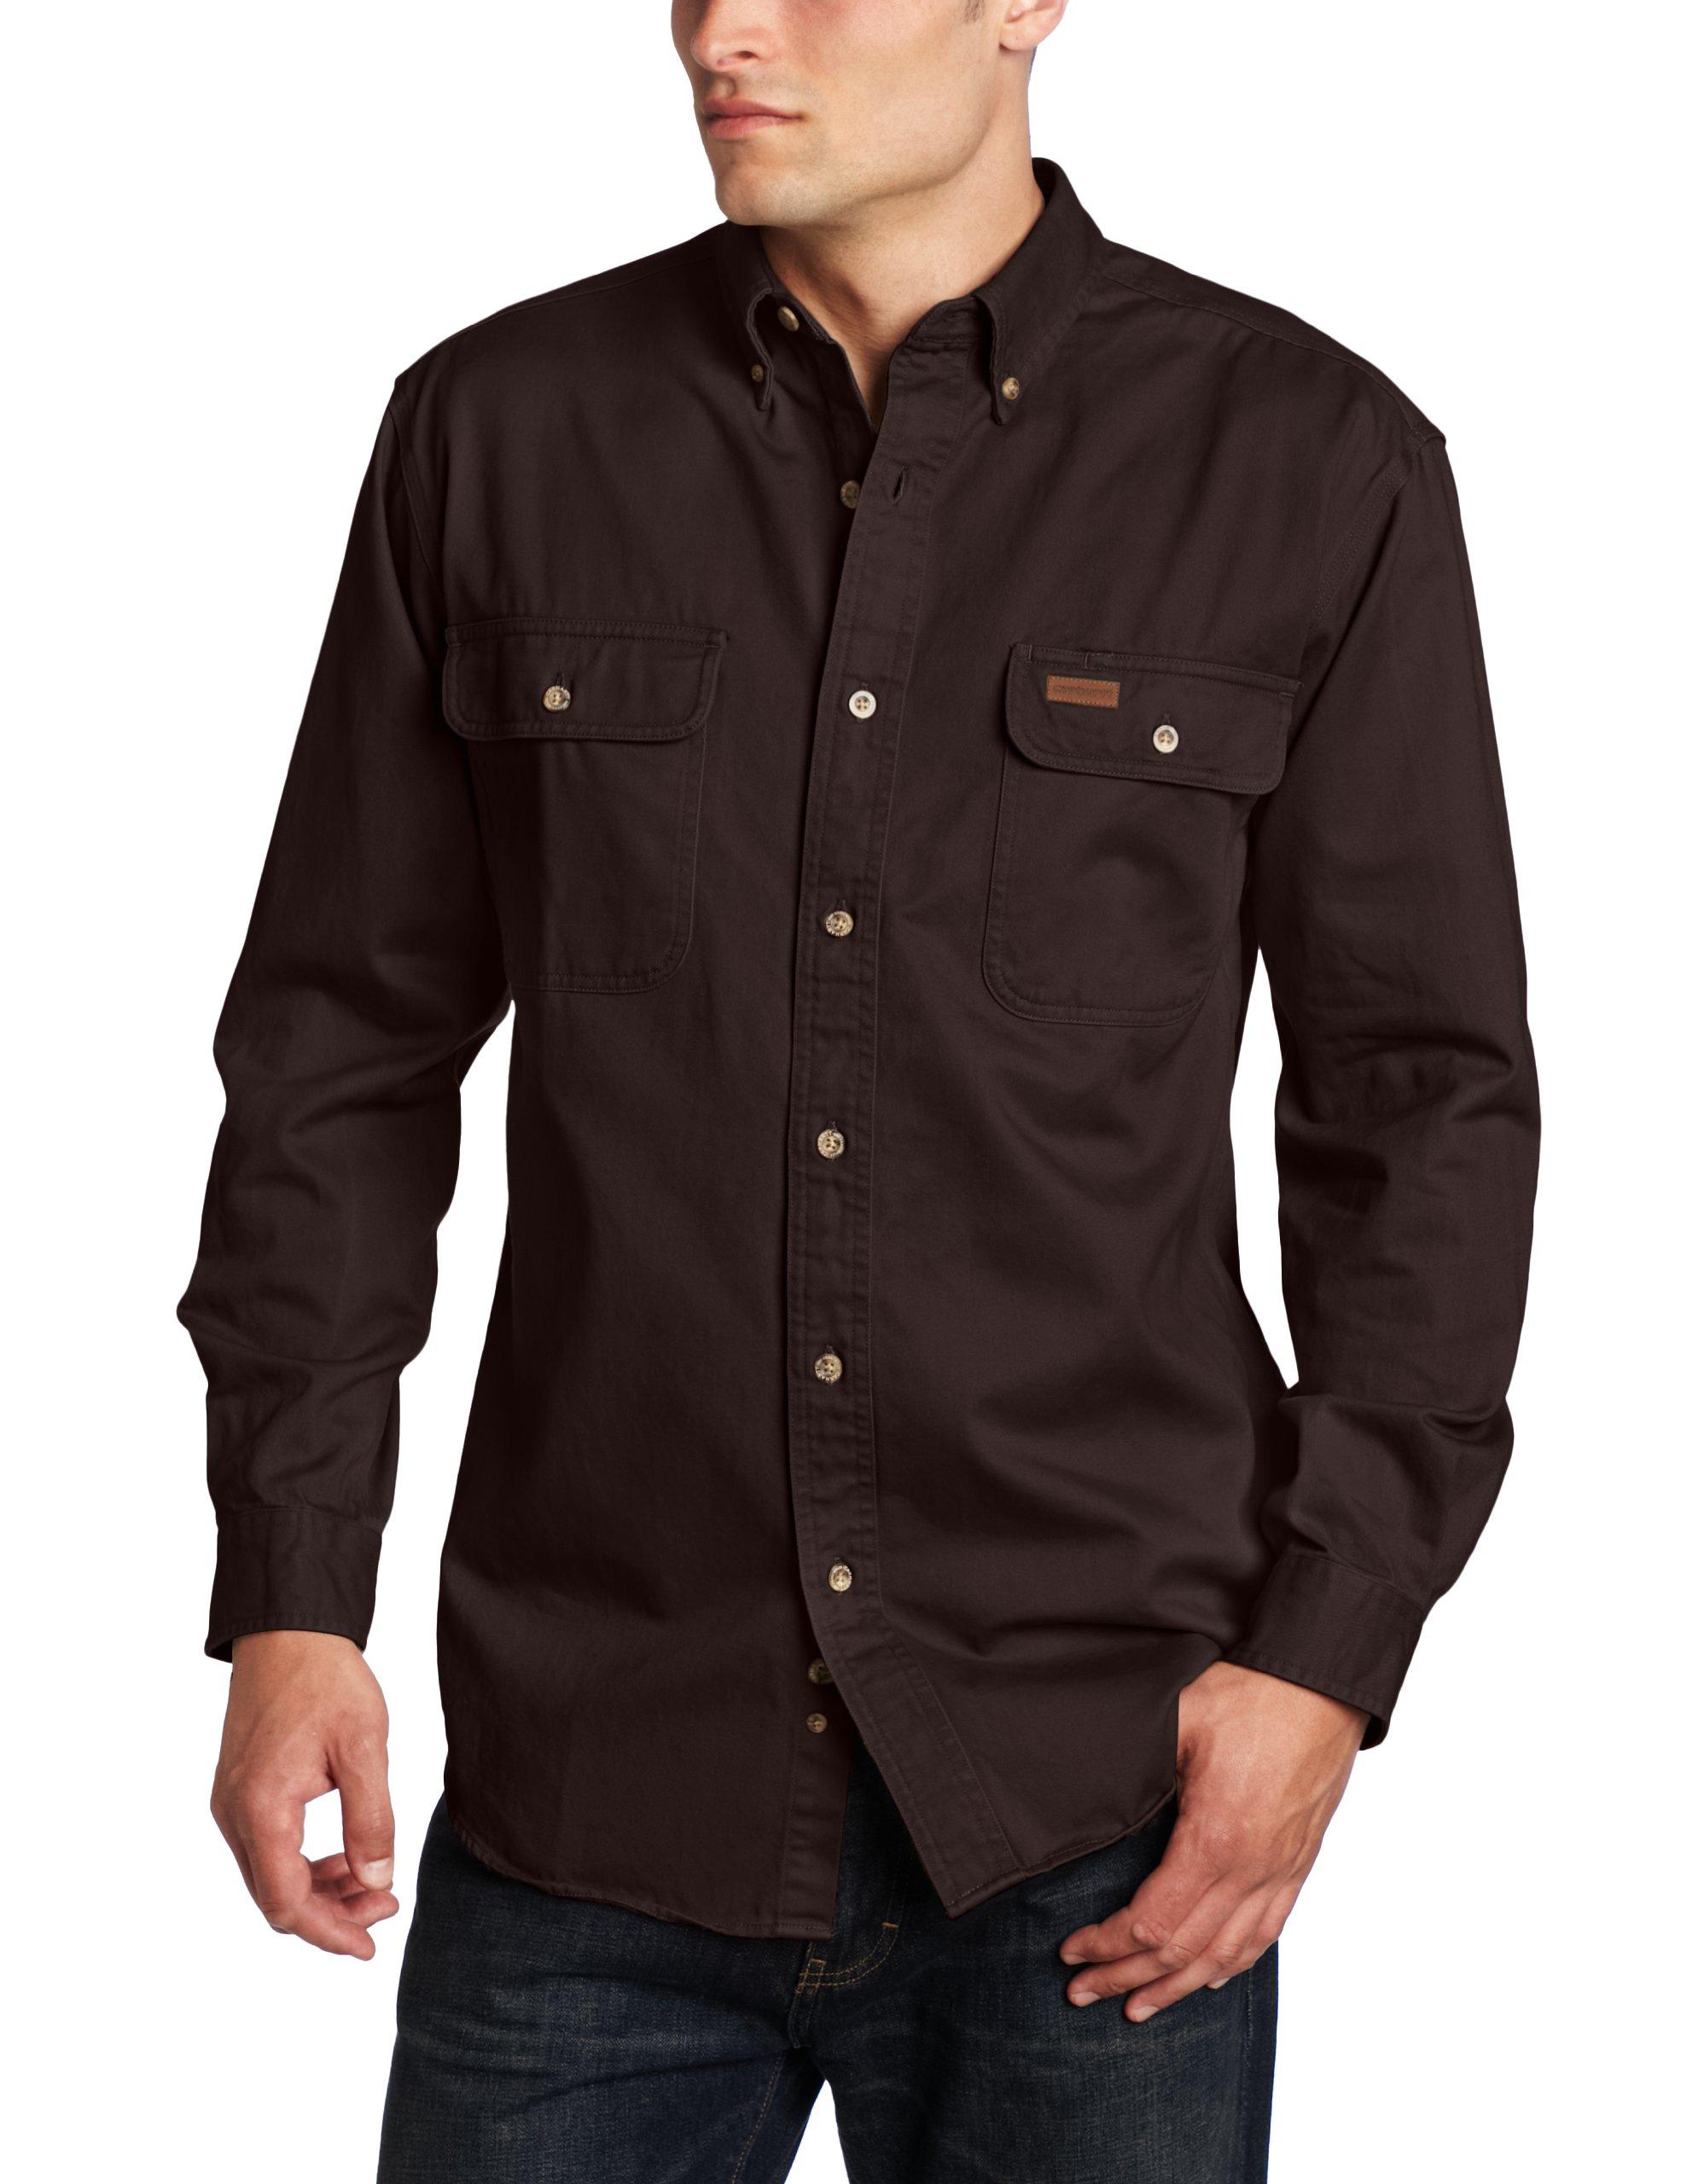 Carhartt Men's Oakman Sandstone Twill Original-Fit Work Shirt, Dark Brown, Regular XX Large by Carhartt (Image #1)